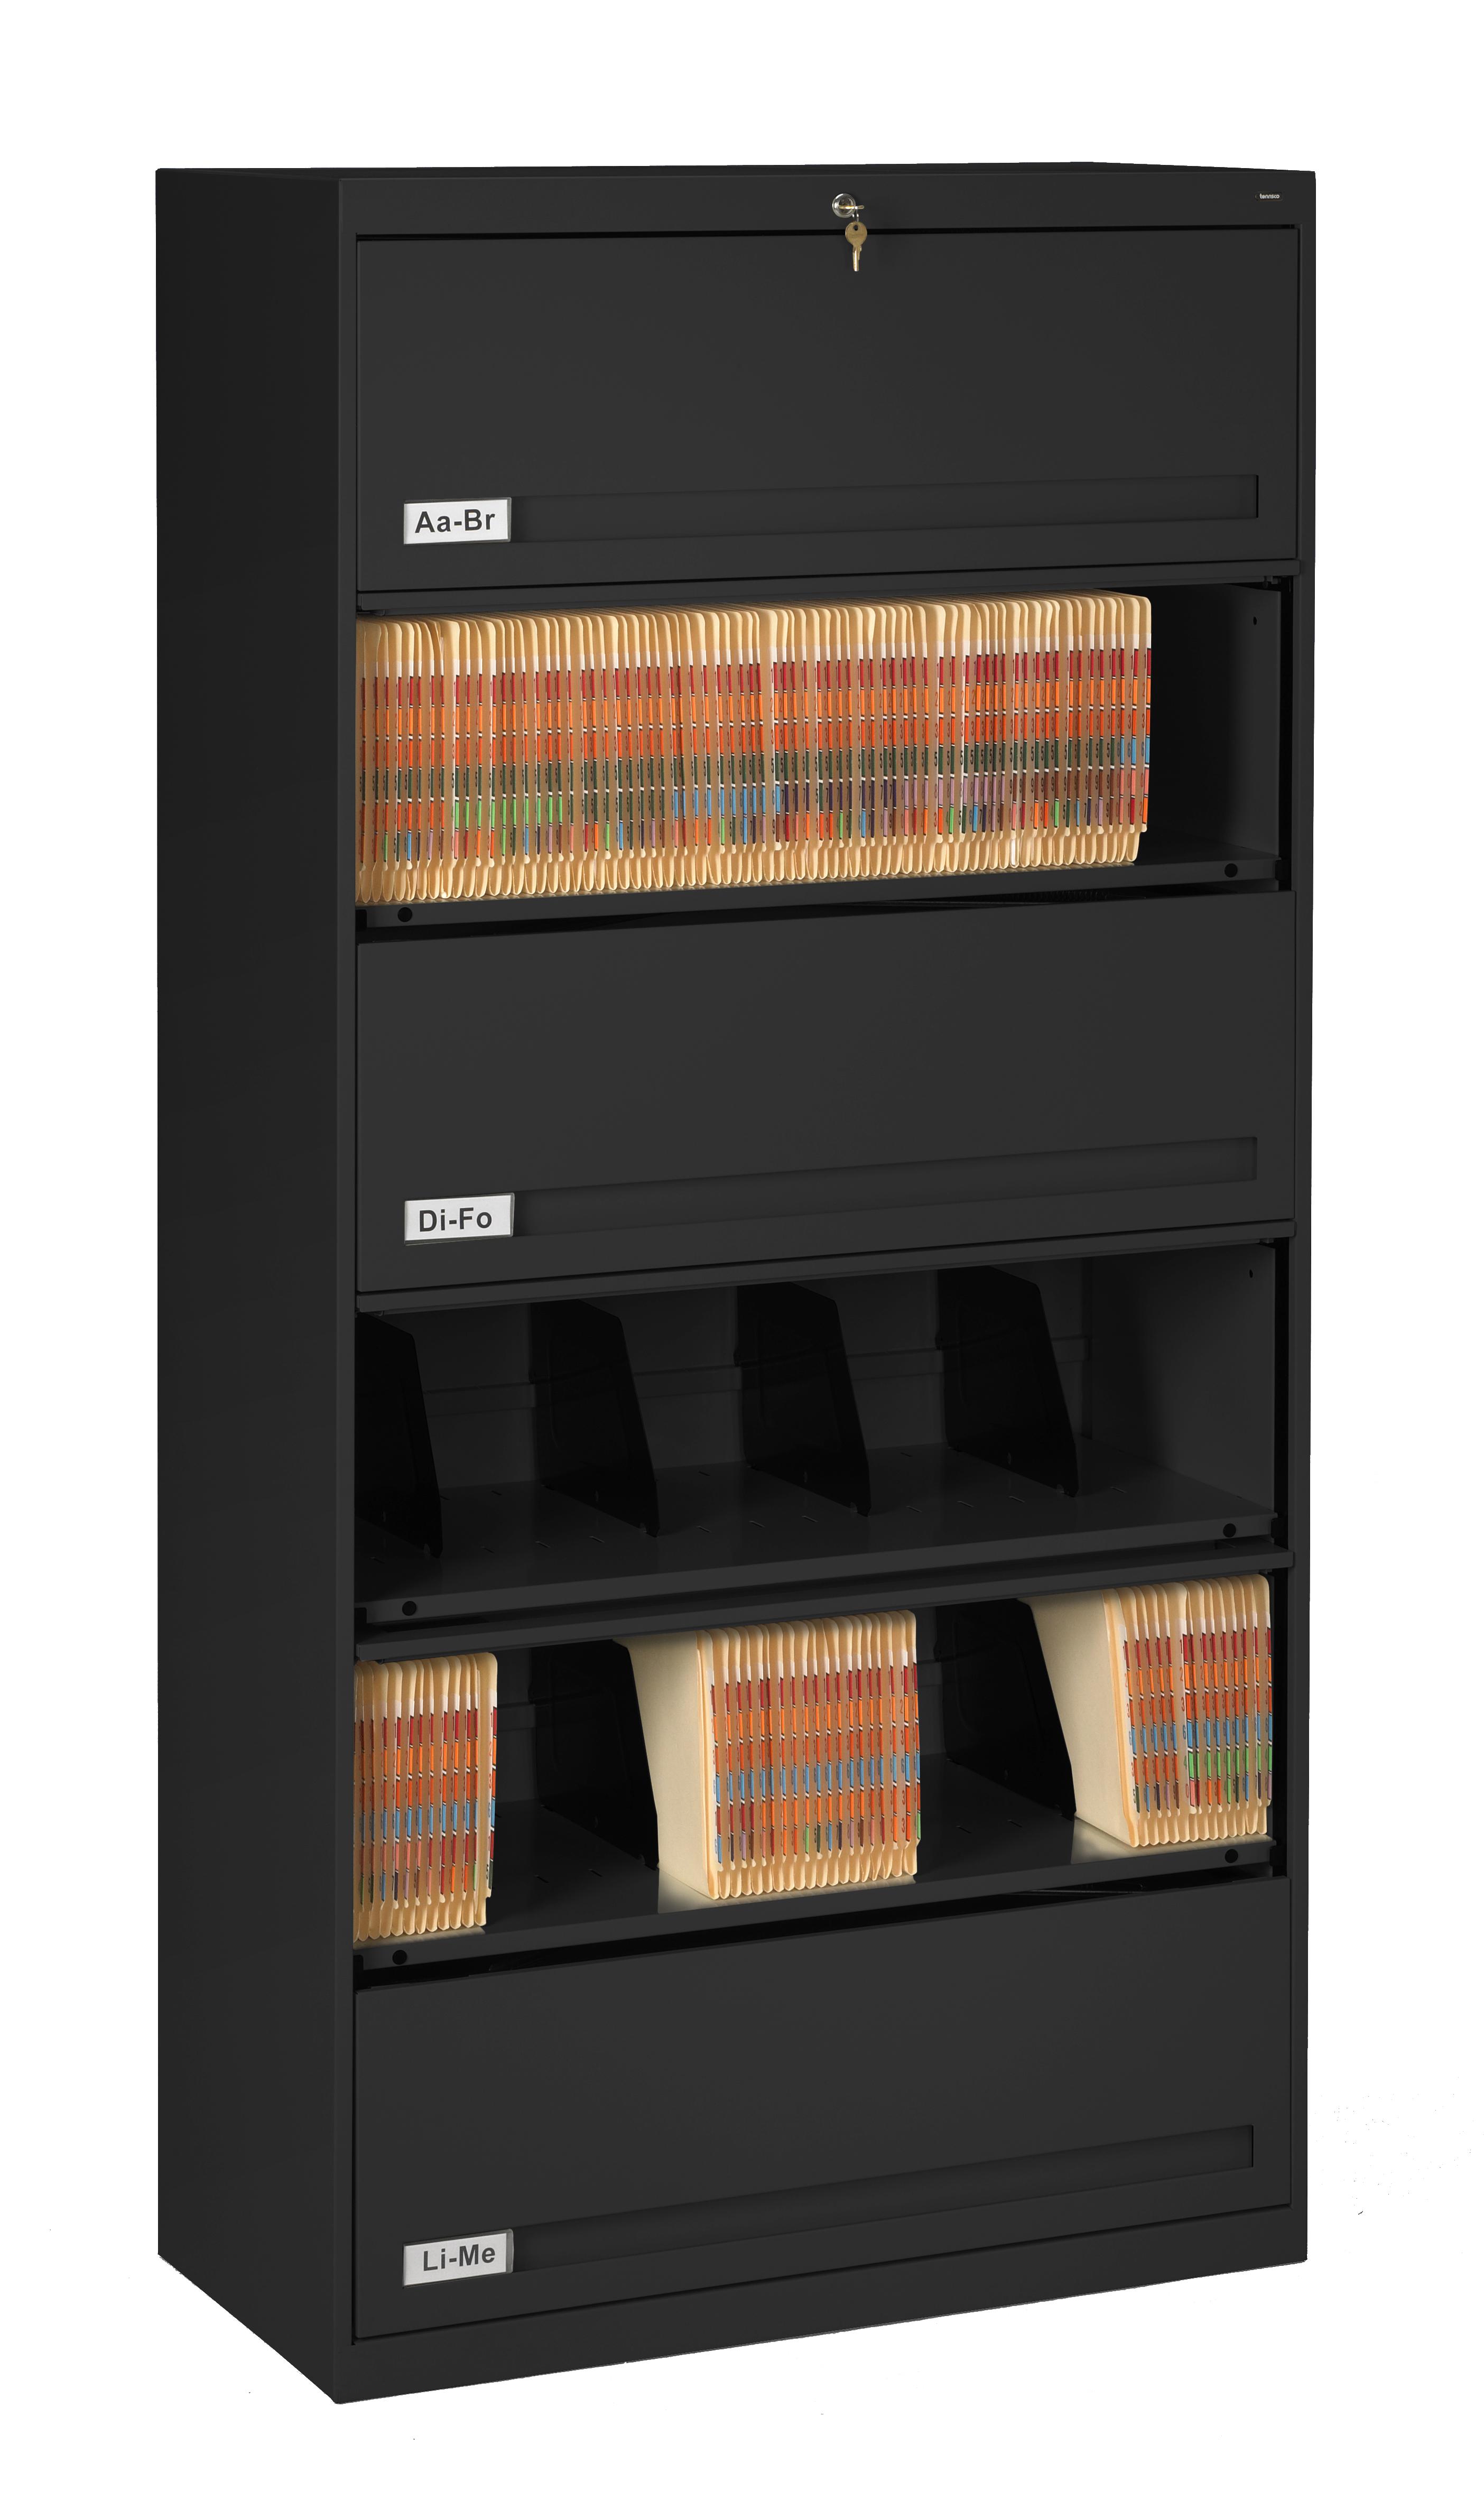 36w x 16 1//2d x 75 1//4 Light Gray Tennsco Closed Fixed Shelf Lateral File